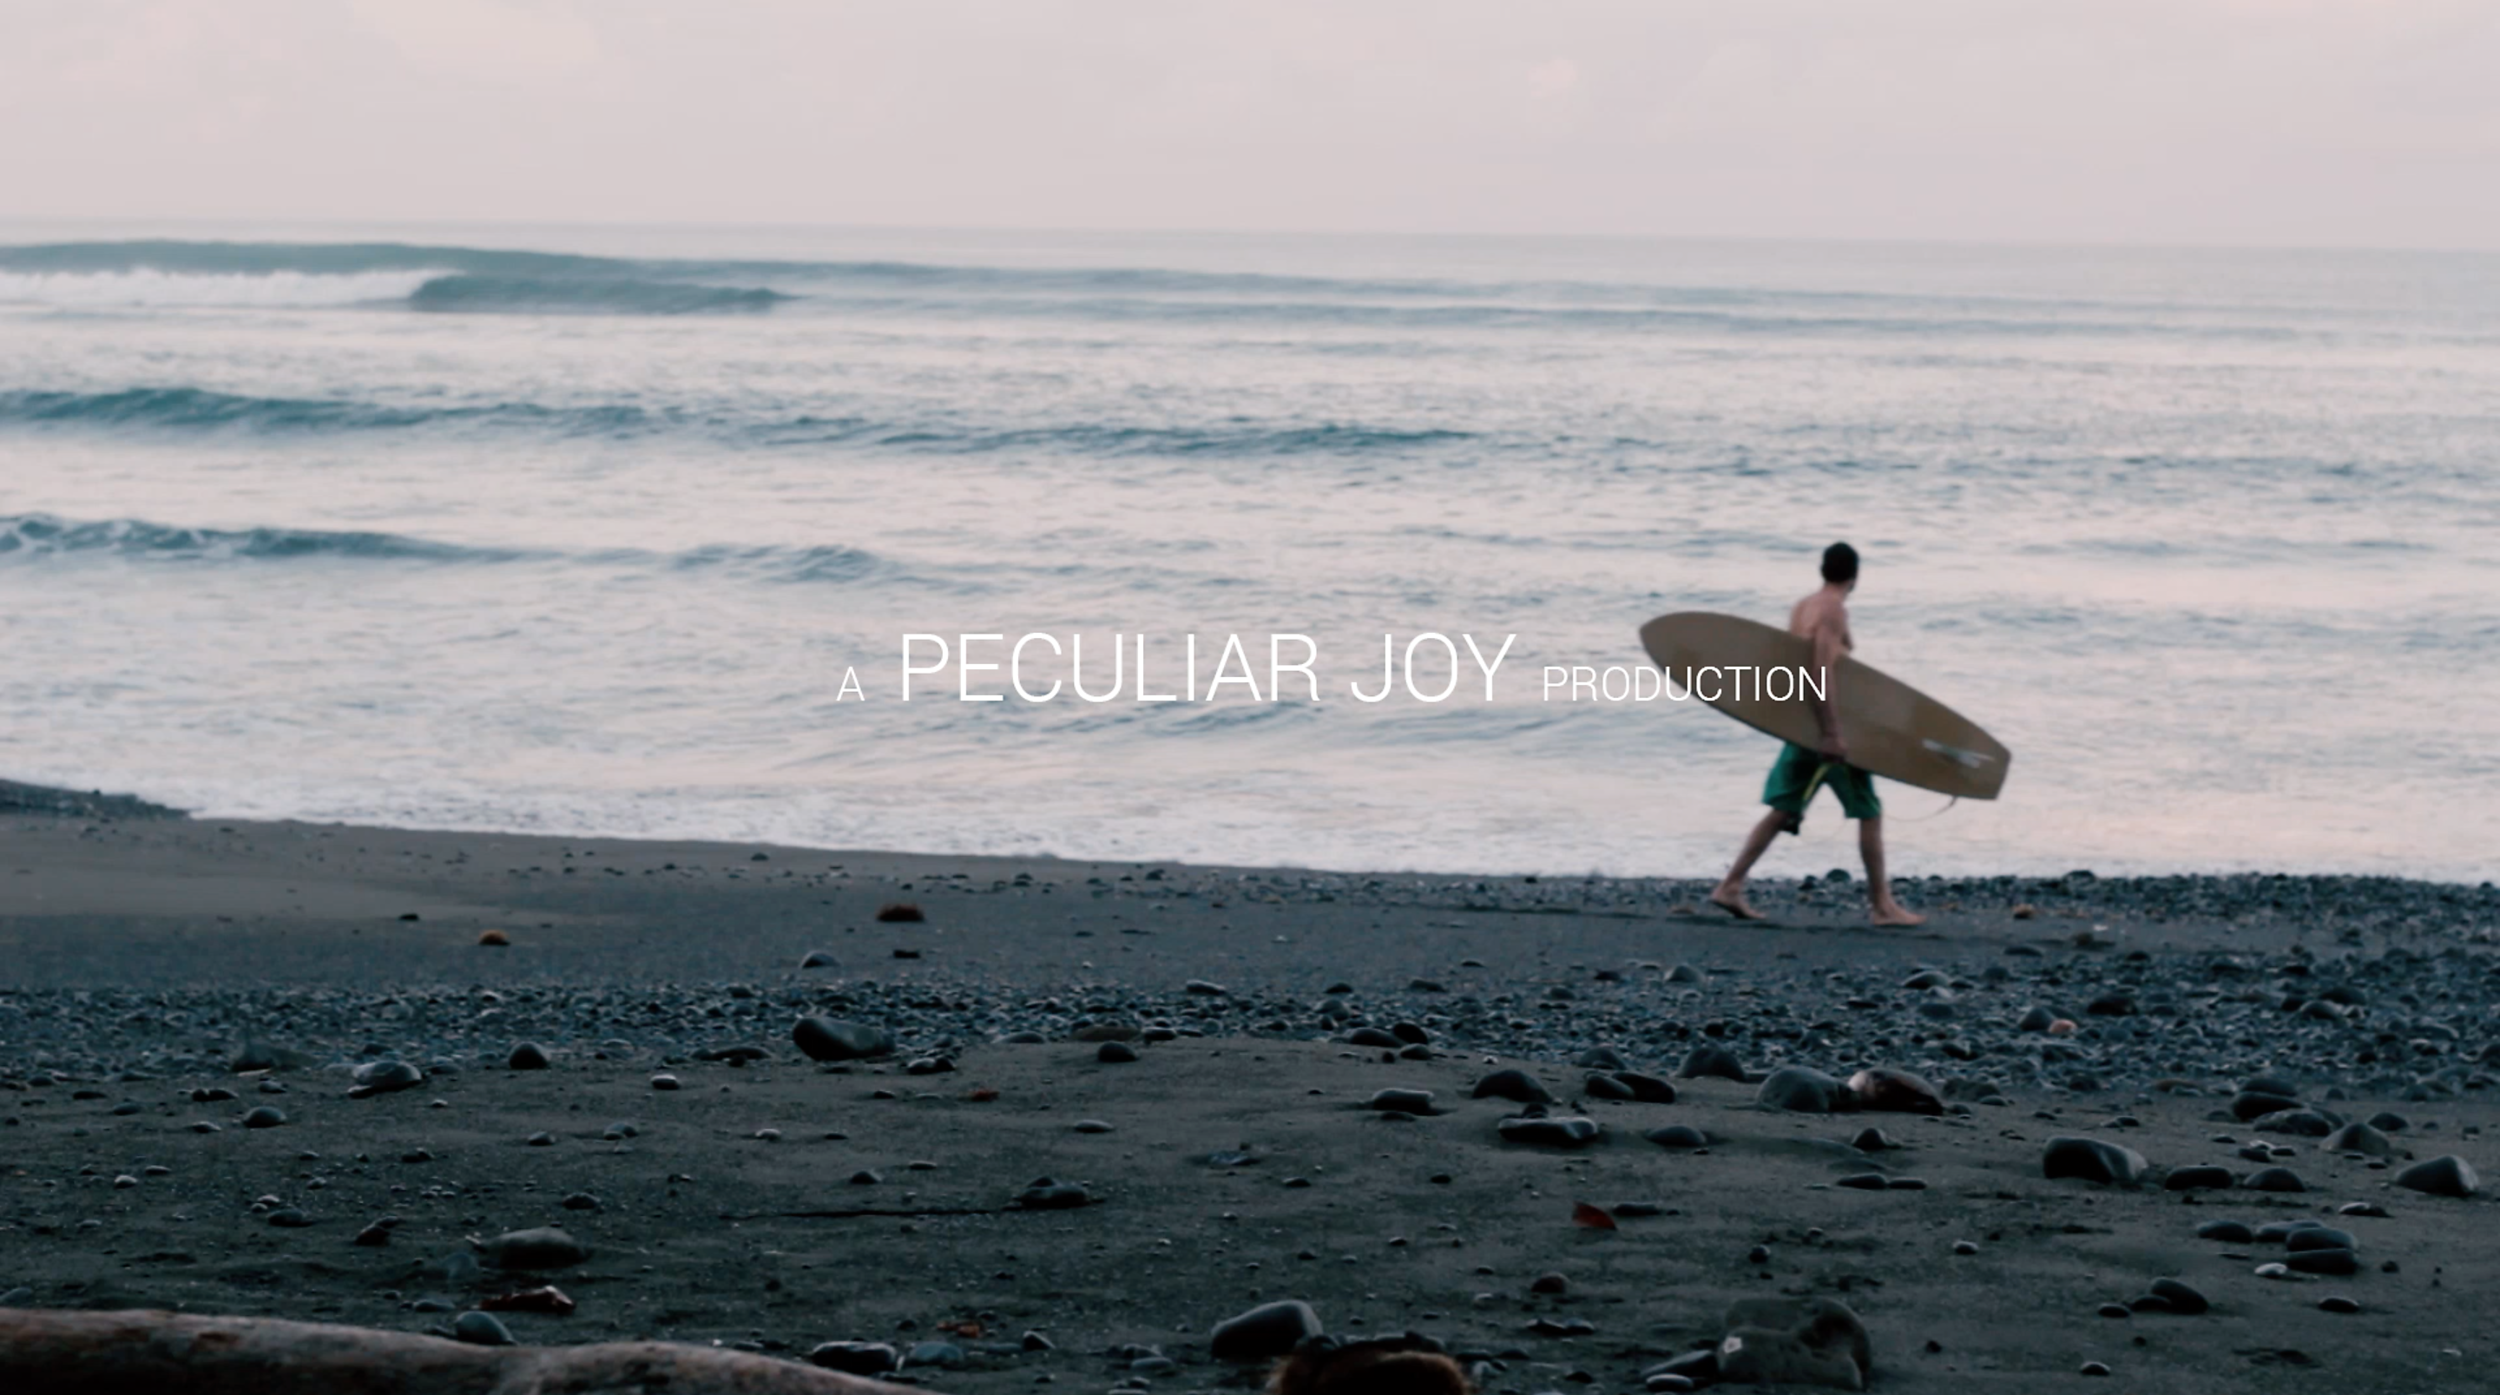 dulce surf film peculiar joy production